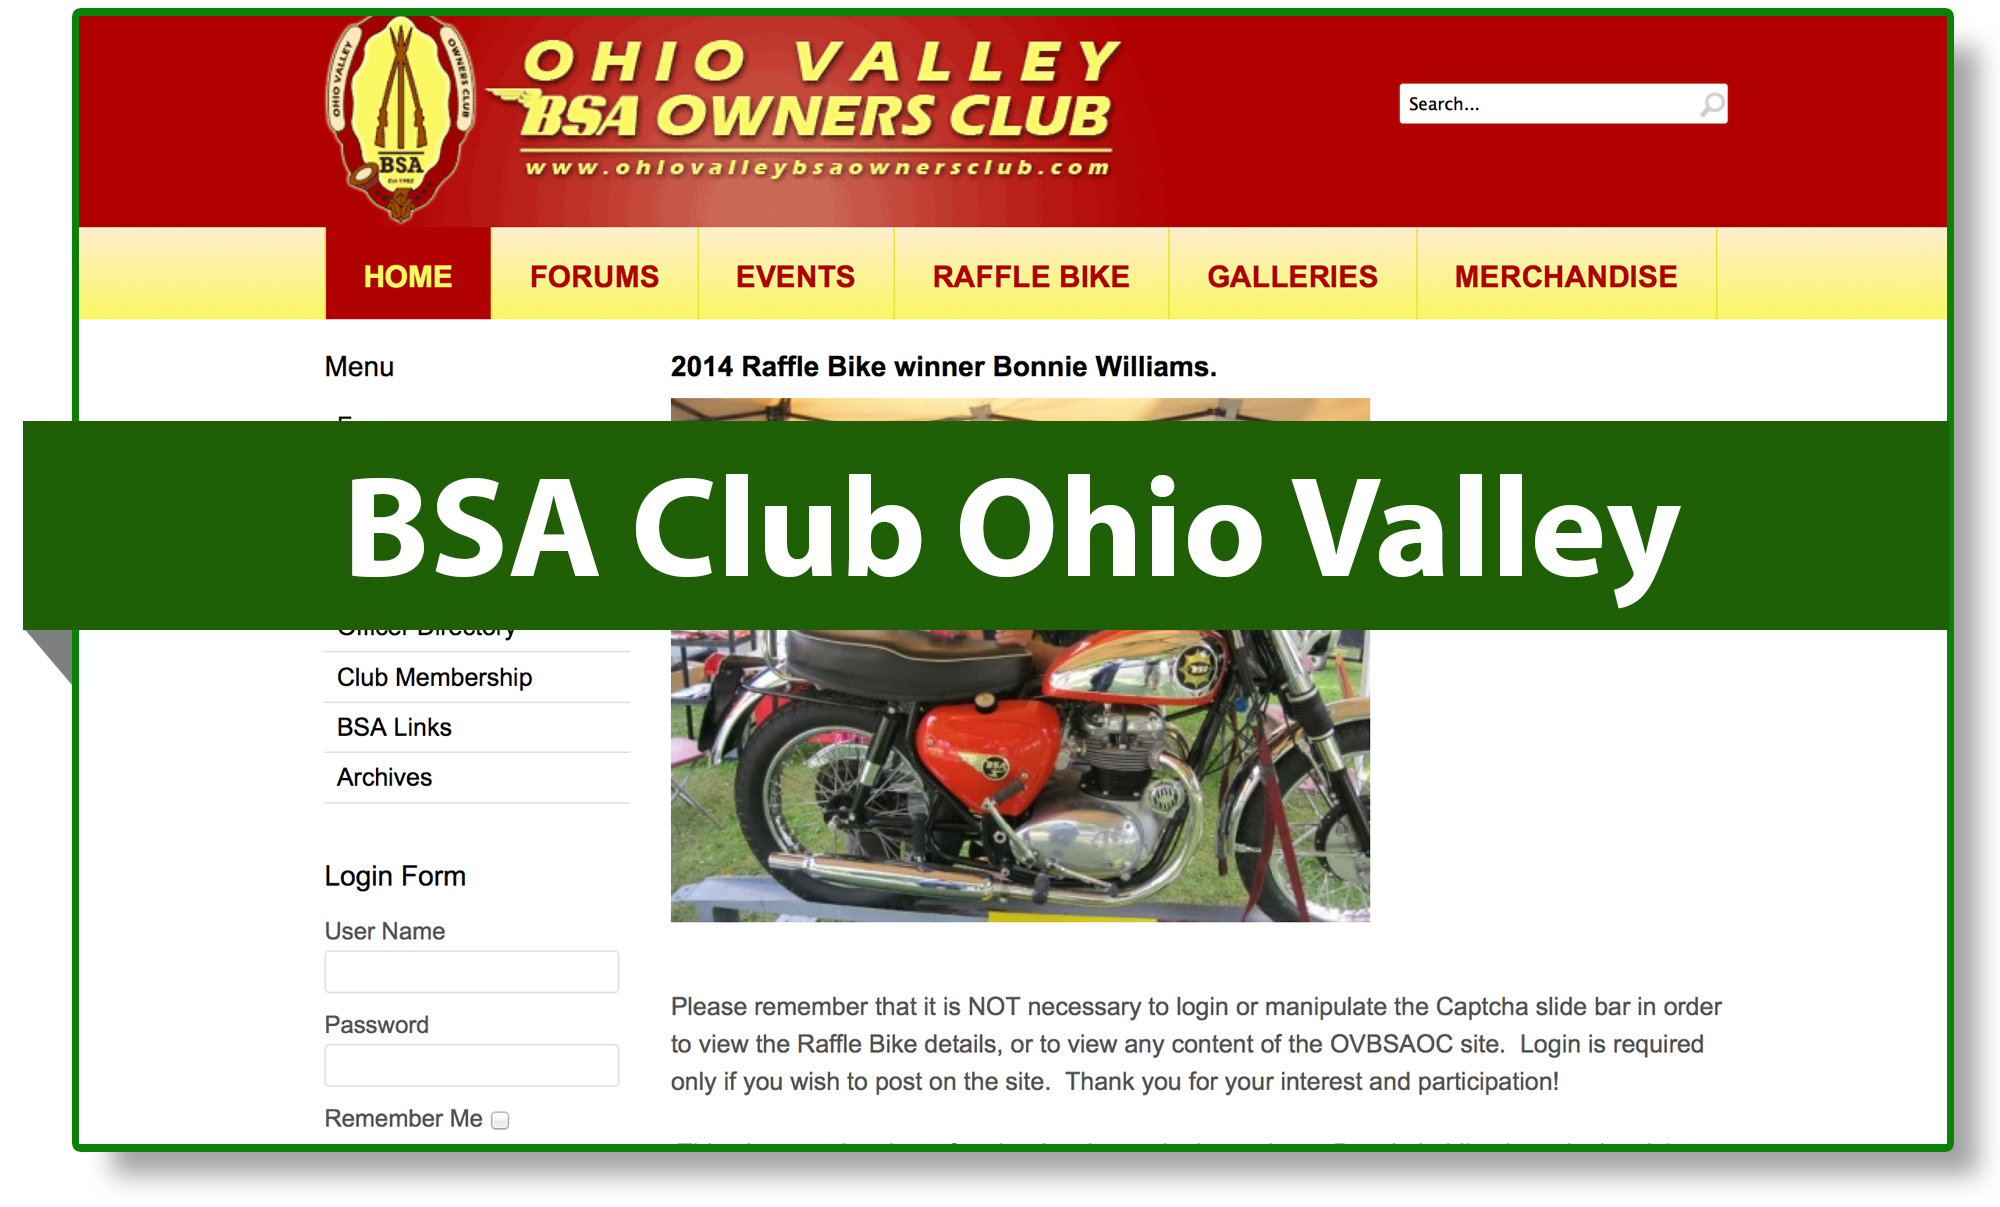 BSA club Ohio Valley